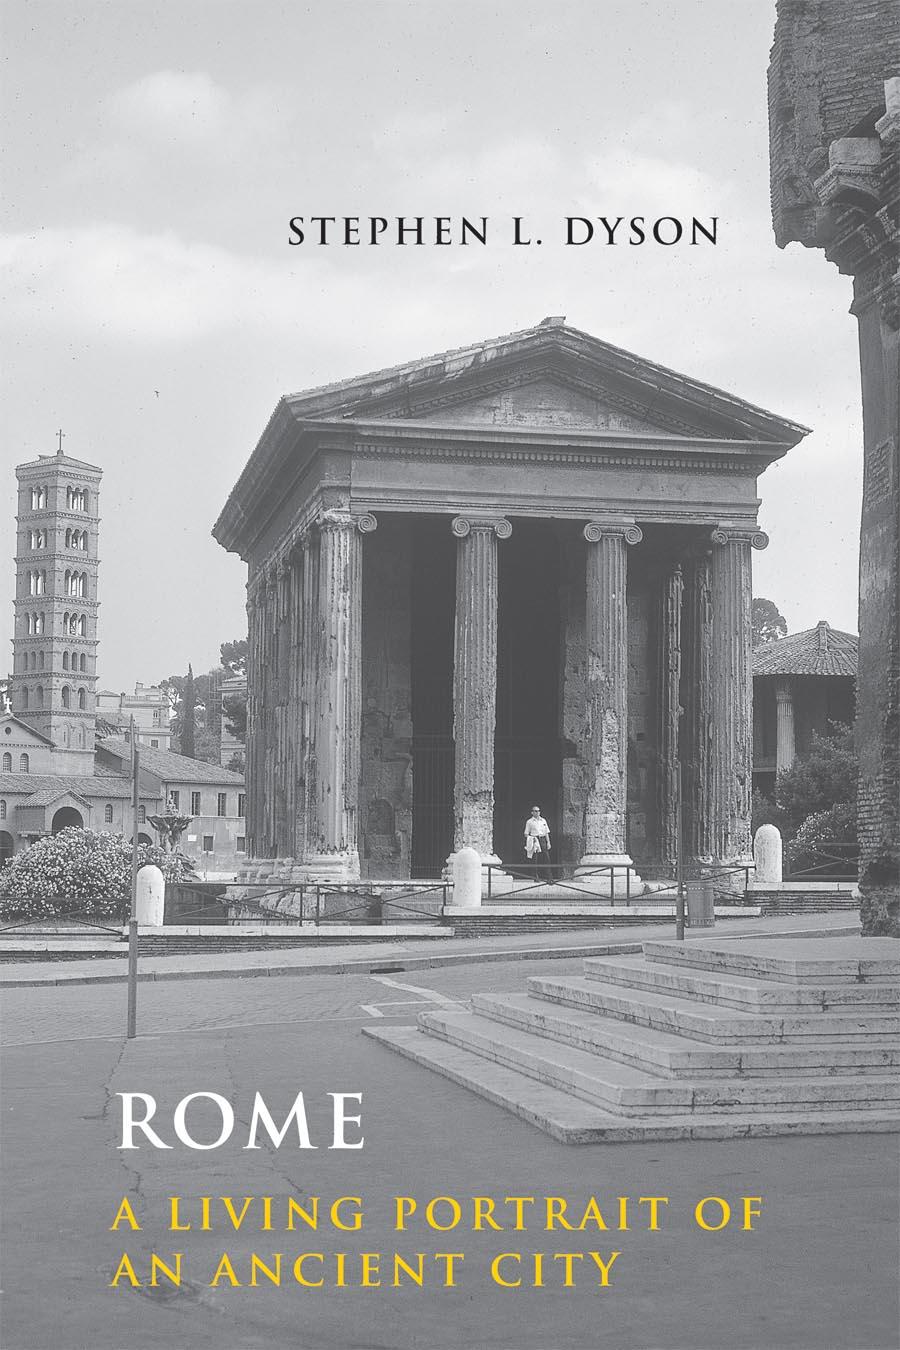 Rome – A Living Portrait of an Ancient City